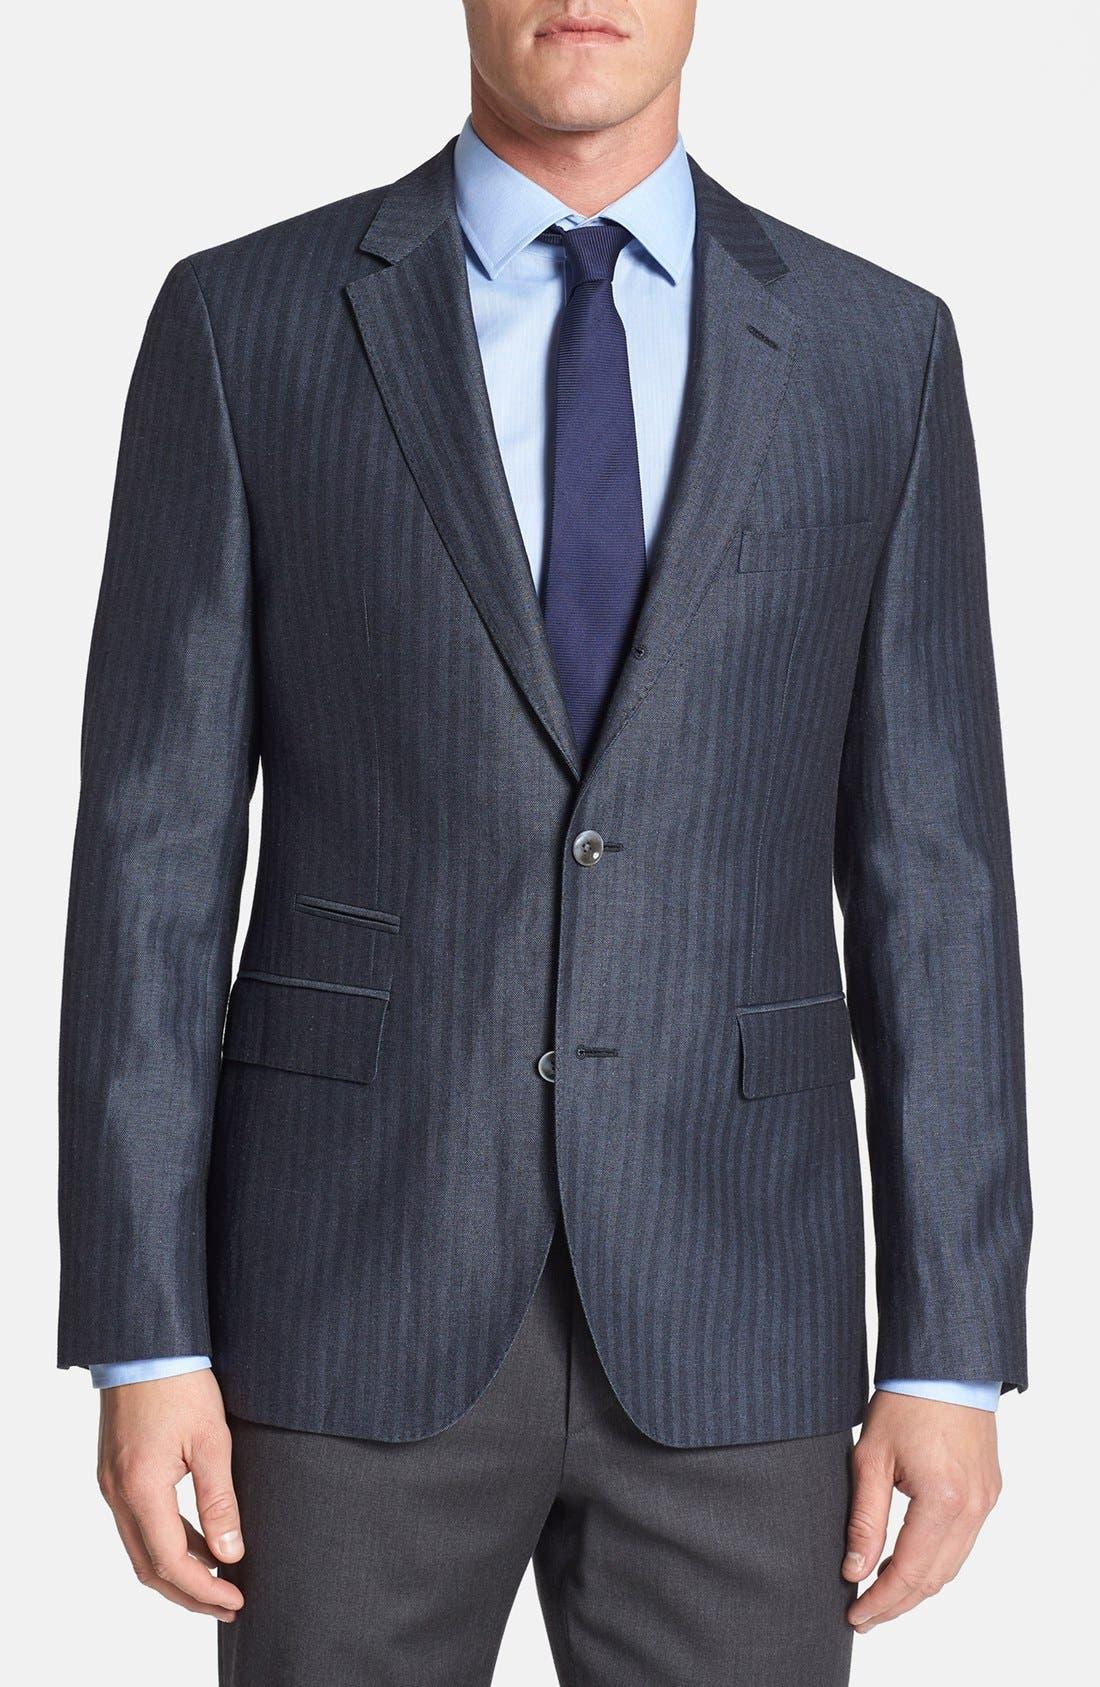 Alternate Image 1 Selected - BOSS HUGO BOSS 'Johnston' Trim Fit Herringbone Sportcoat